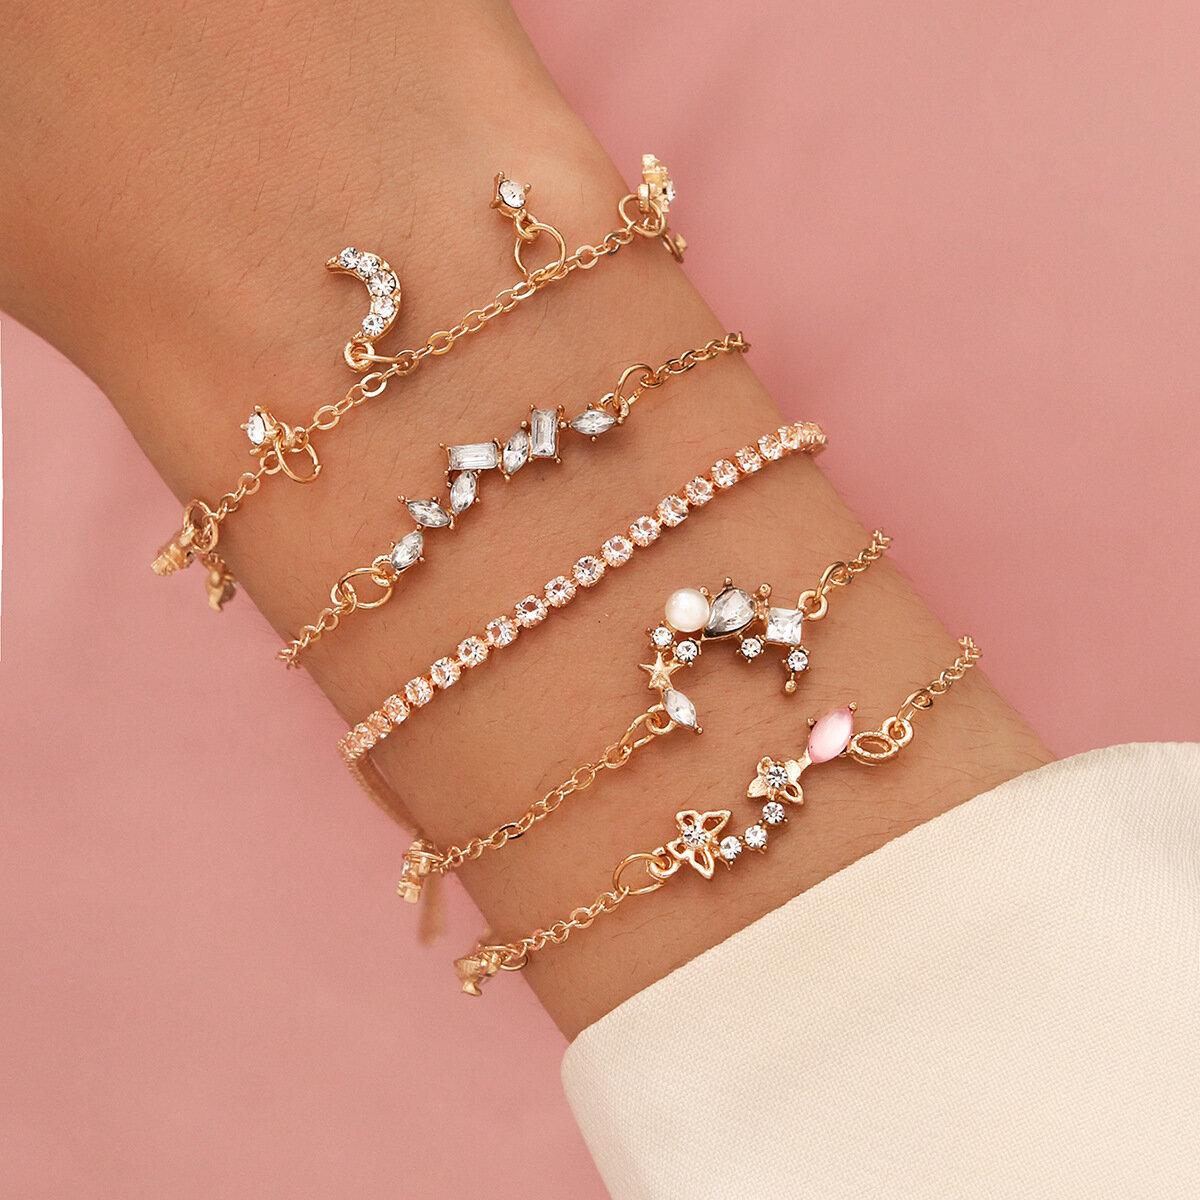 5Pcs Sweet Butterflies Bracelet Set Diamonds Star Moon Imitation Pearls Women Crystal Bracelet